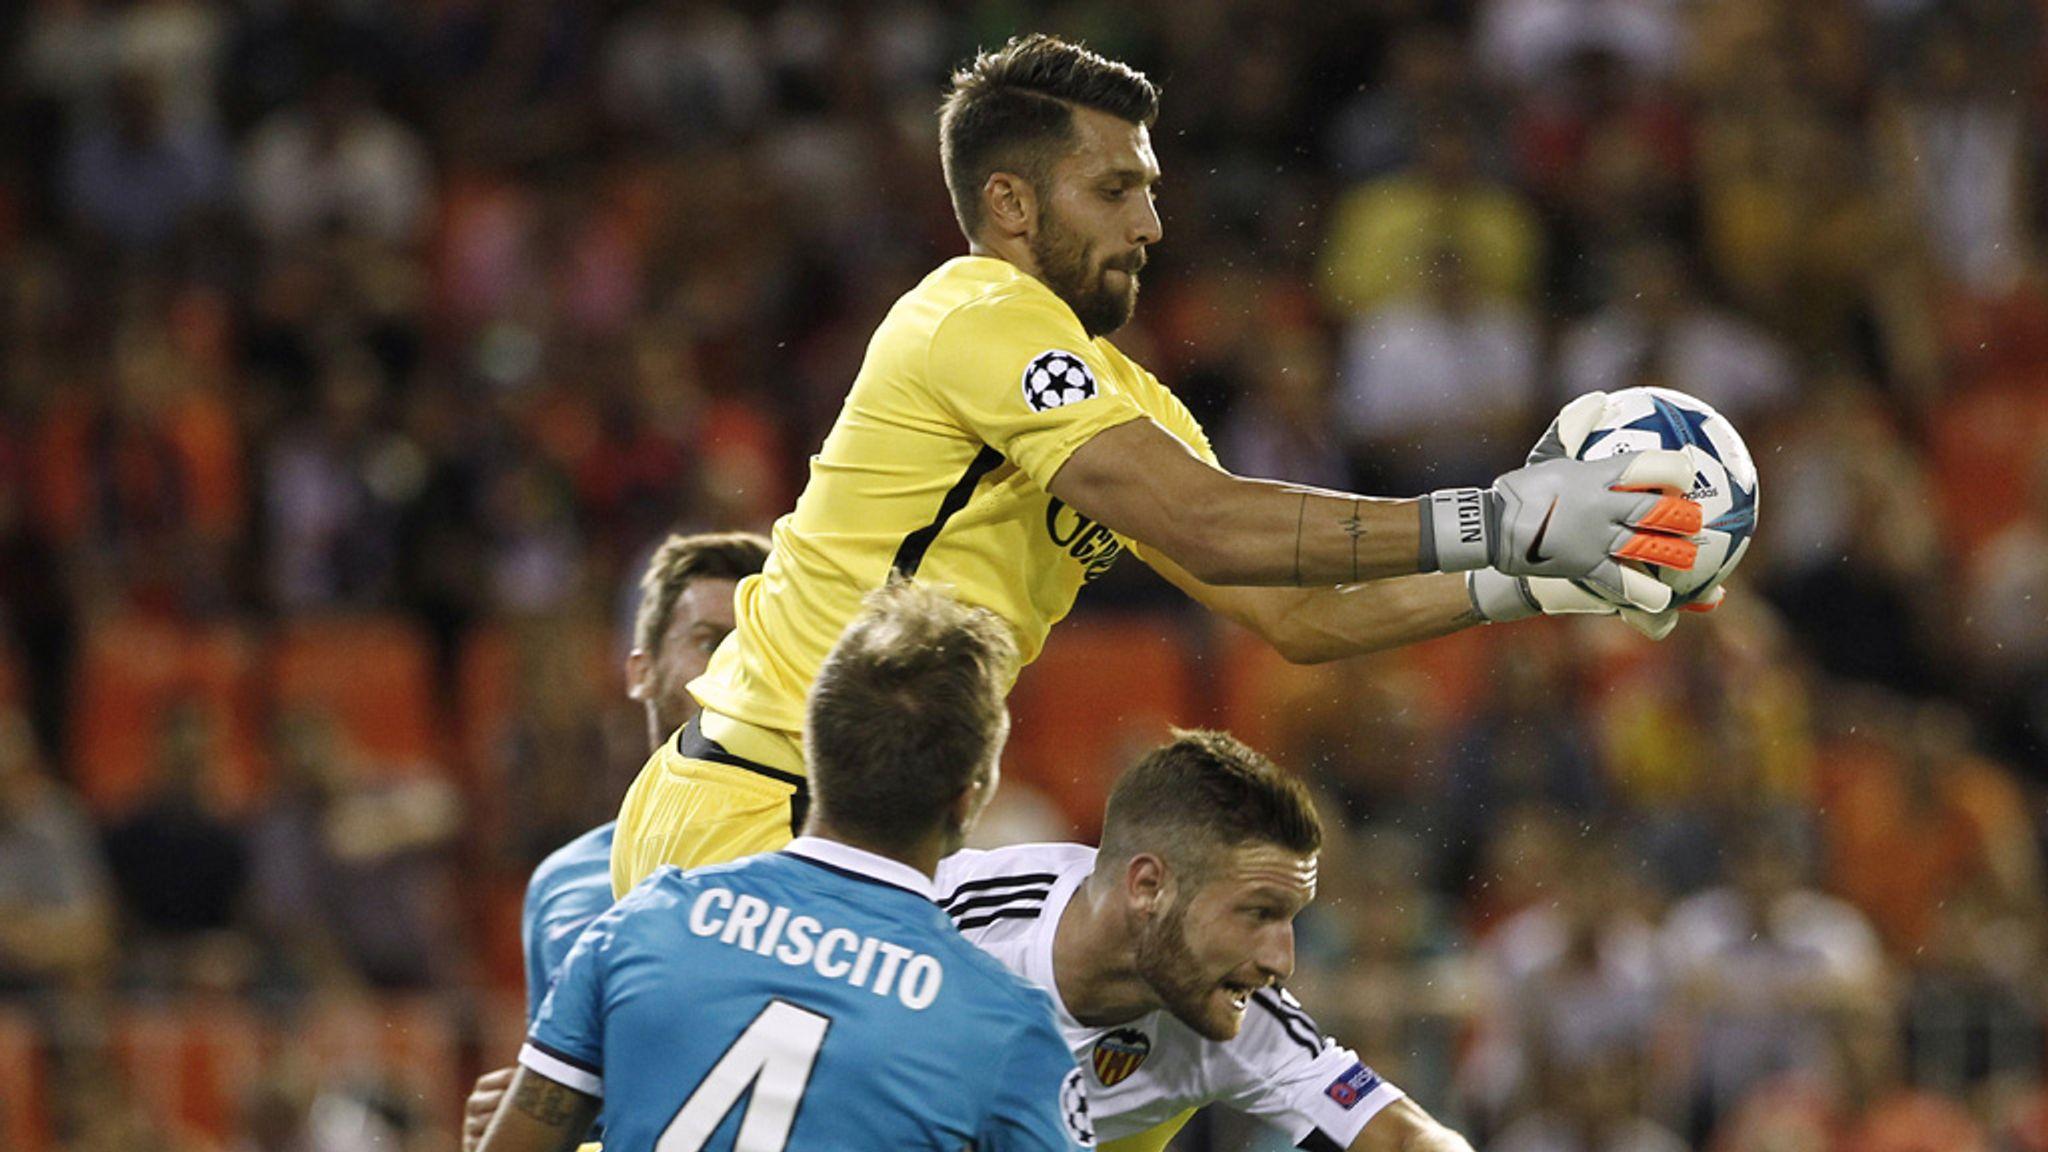 Zenit vs valencia betting lines monday night football betting games